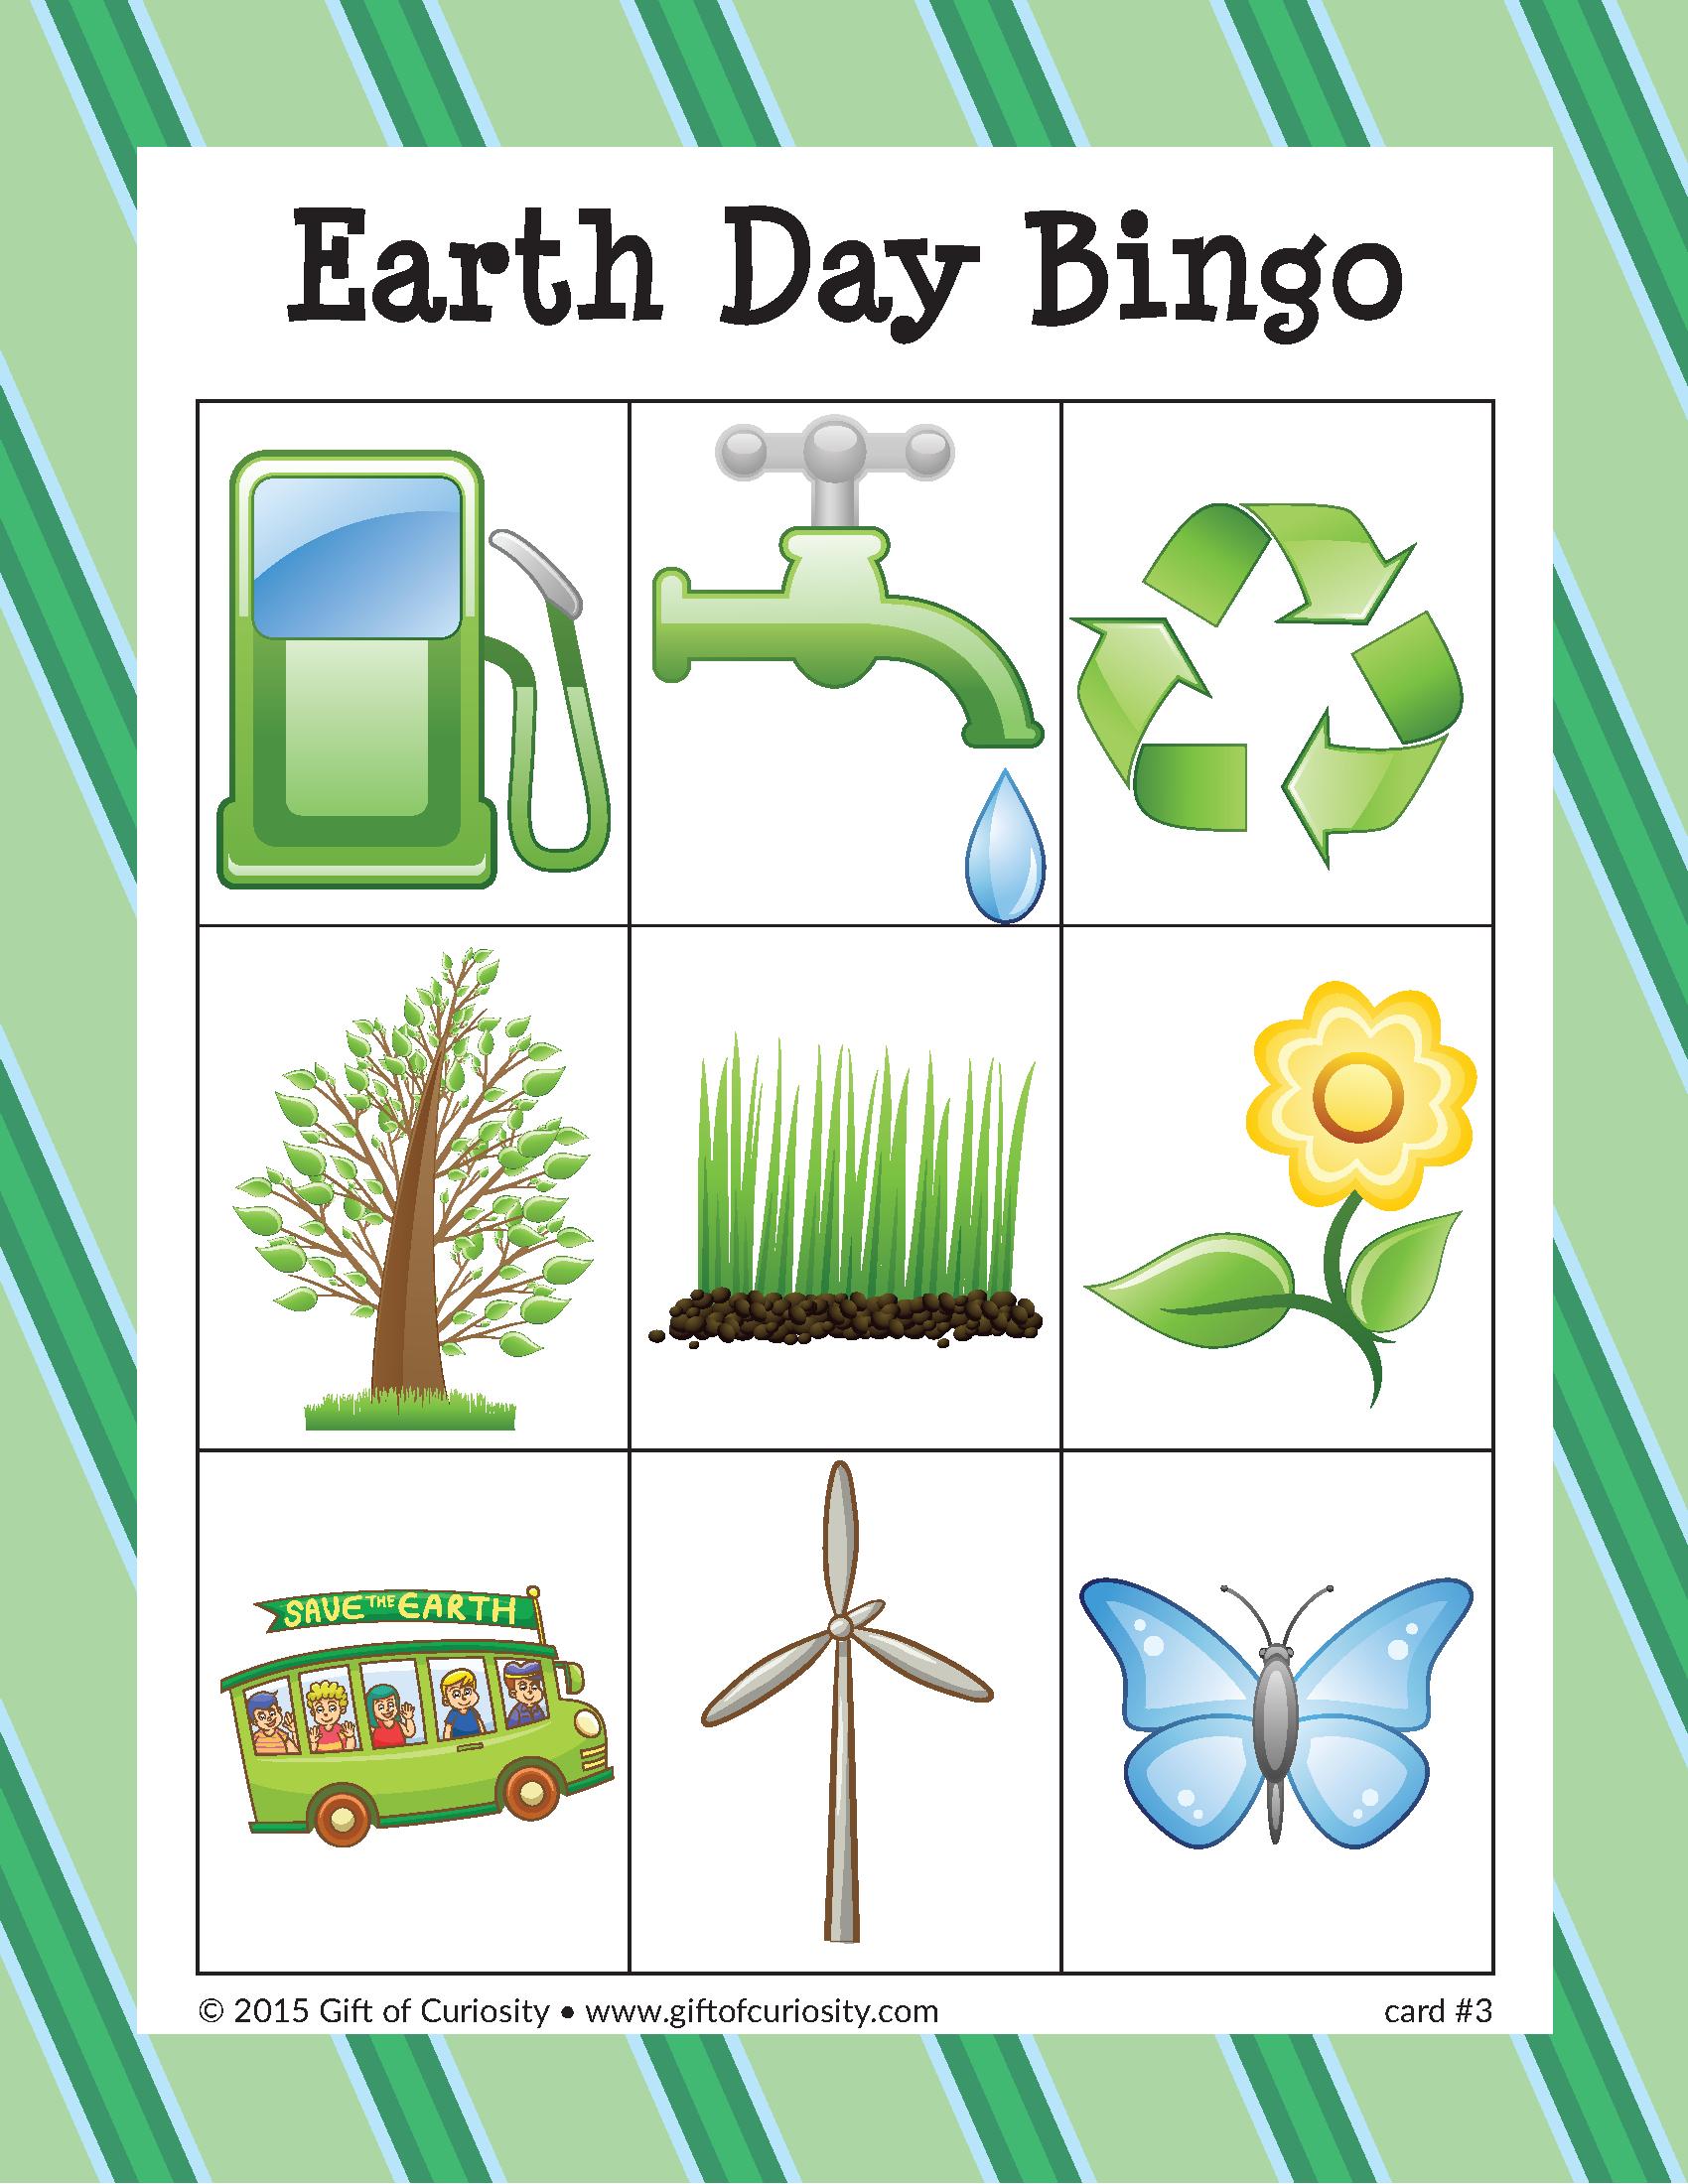 Earth Day Bingo - Gift Of Curiosity